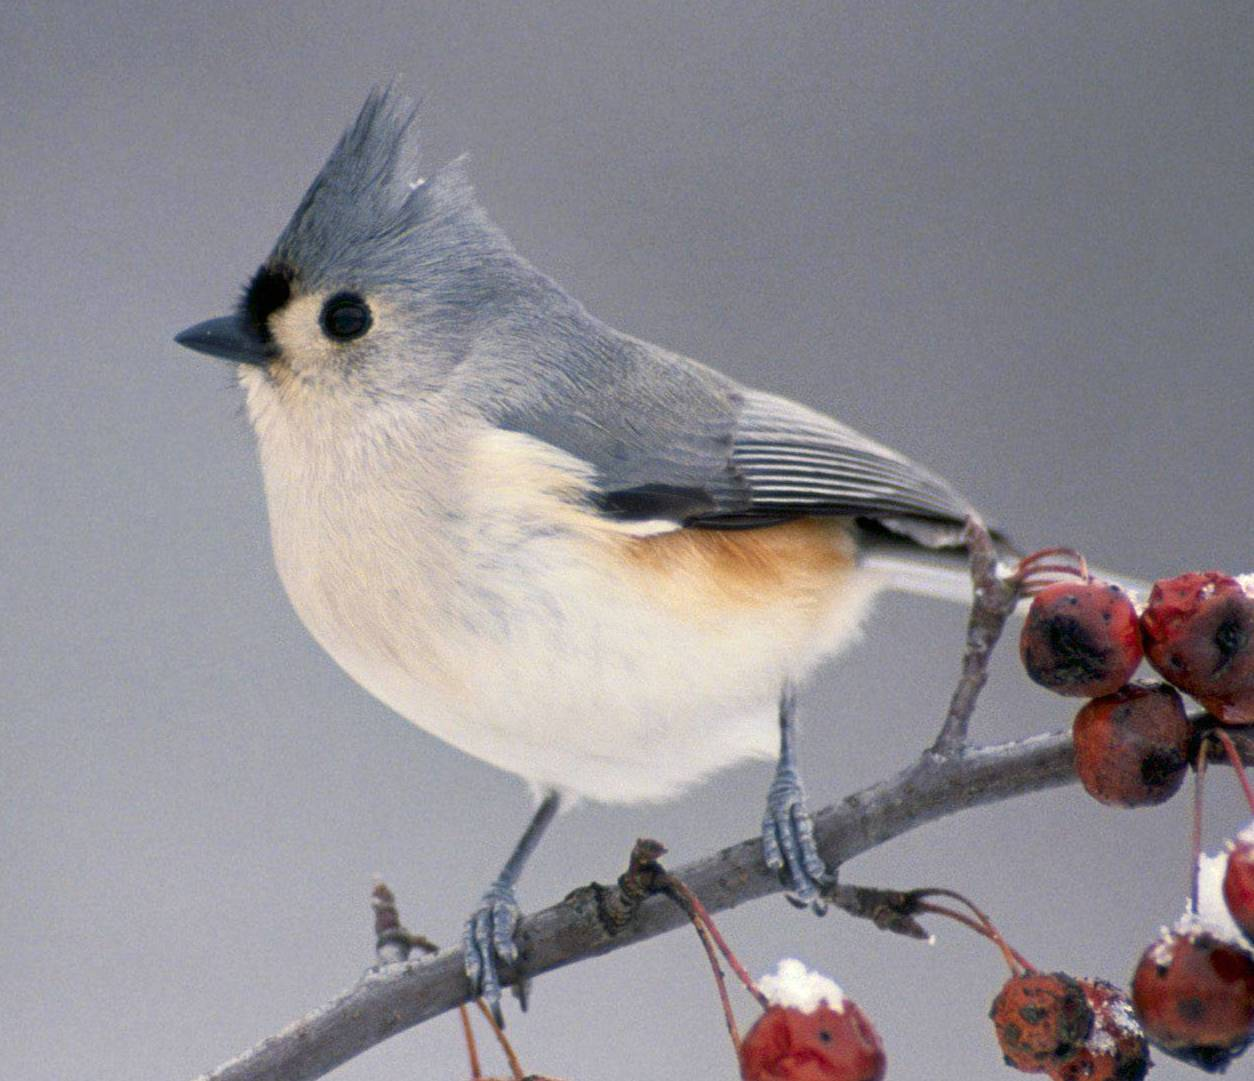 Birds common to Western North Carolina